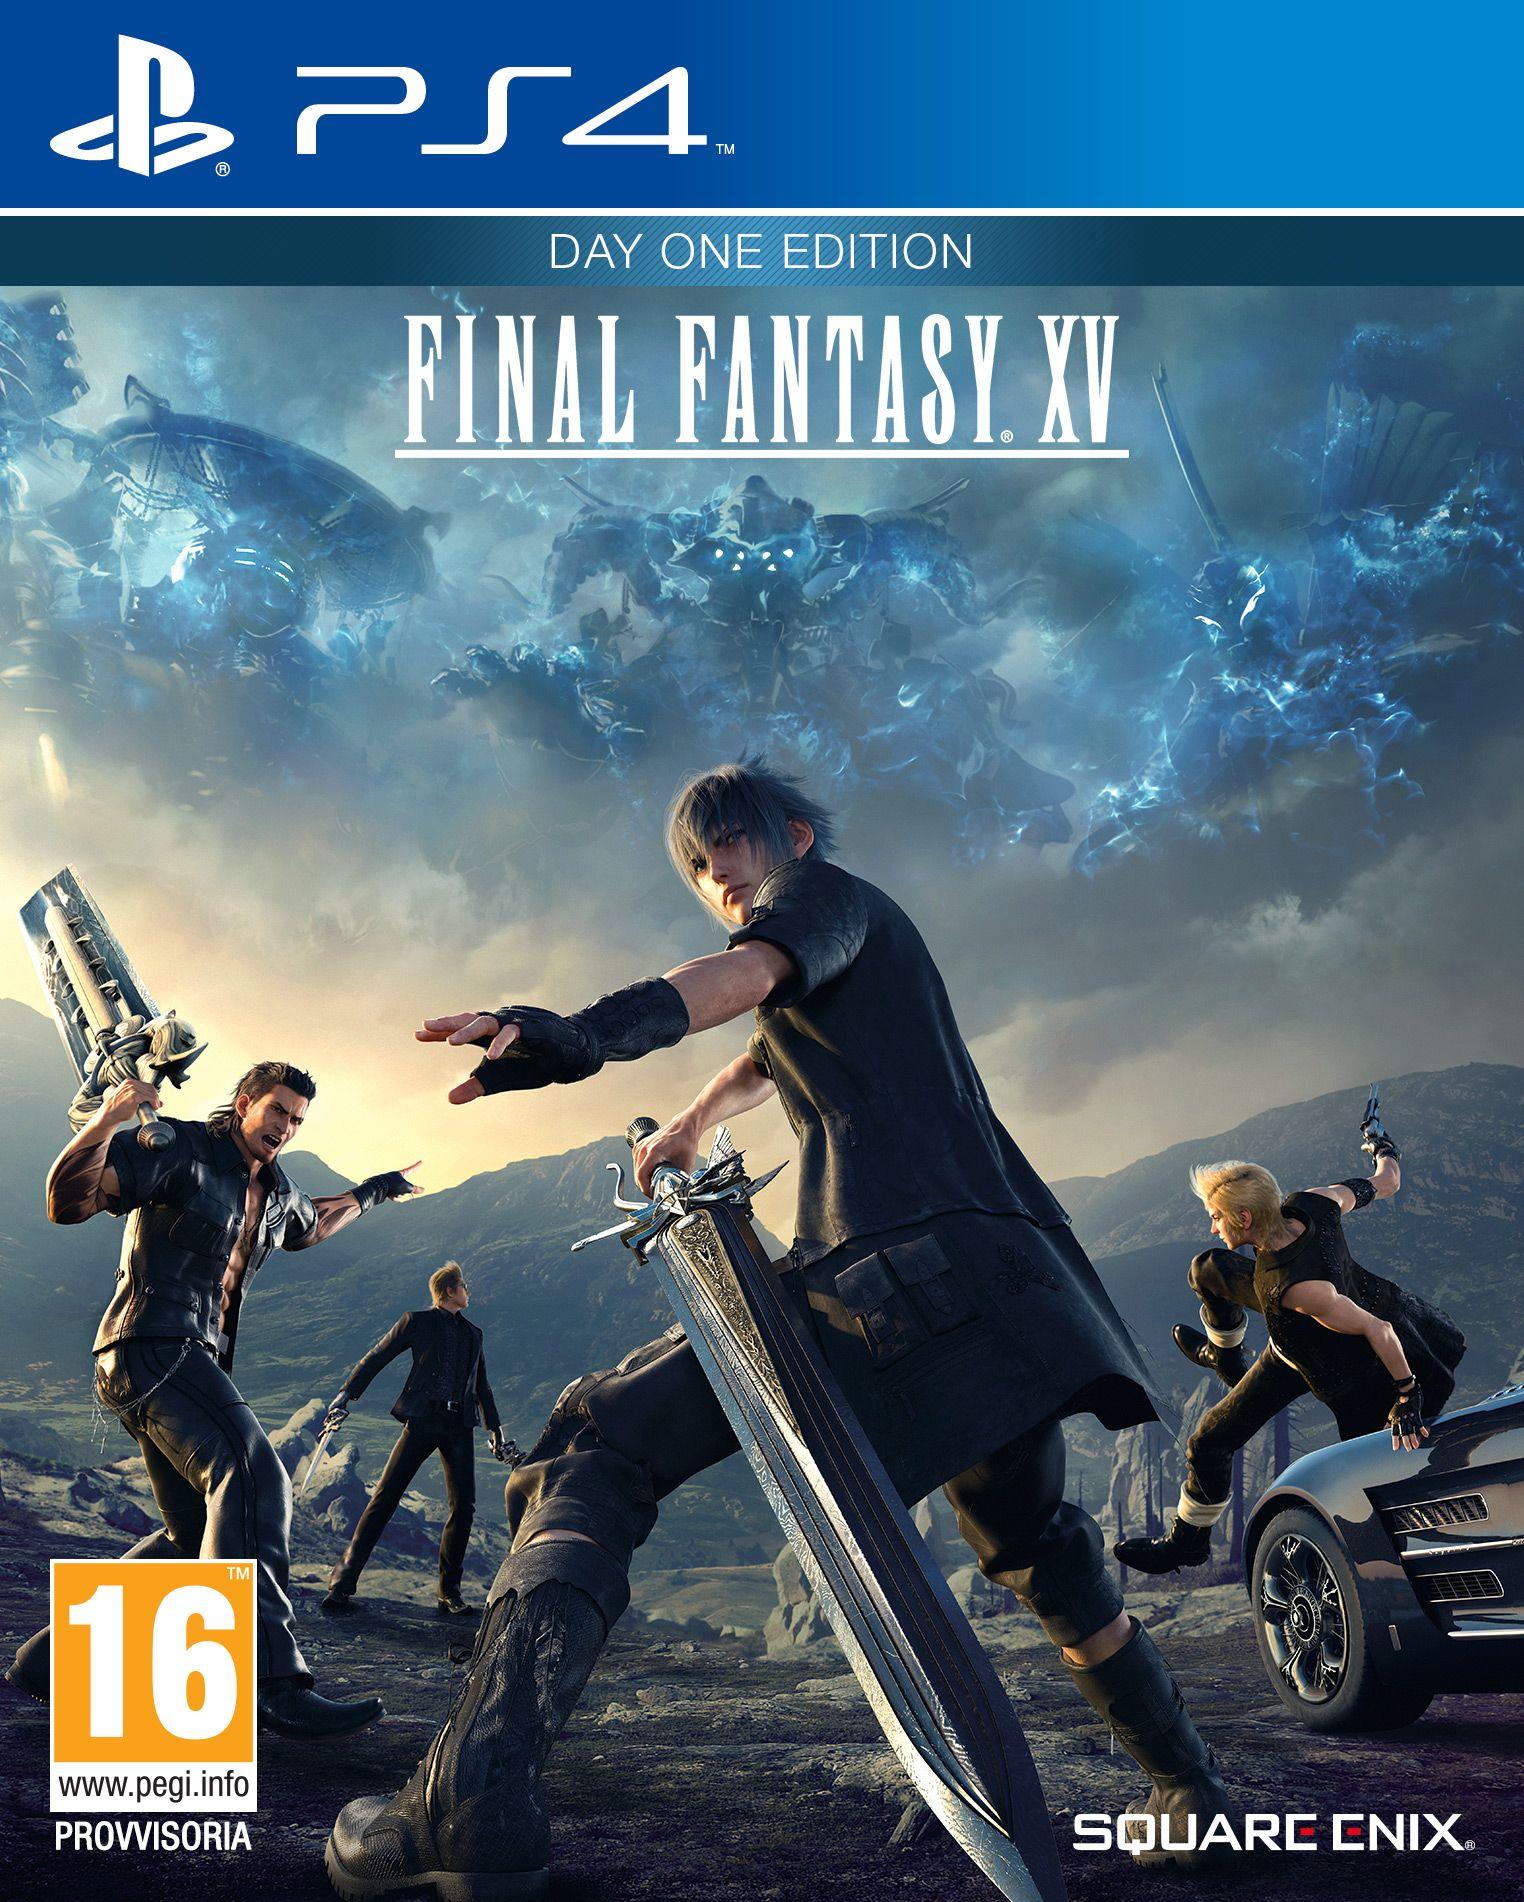 FFXV_Packshot_PS4_ITA